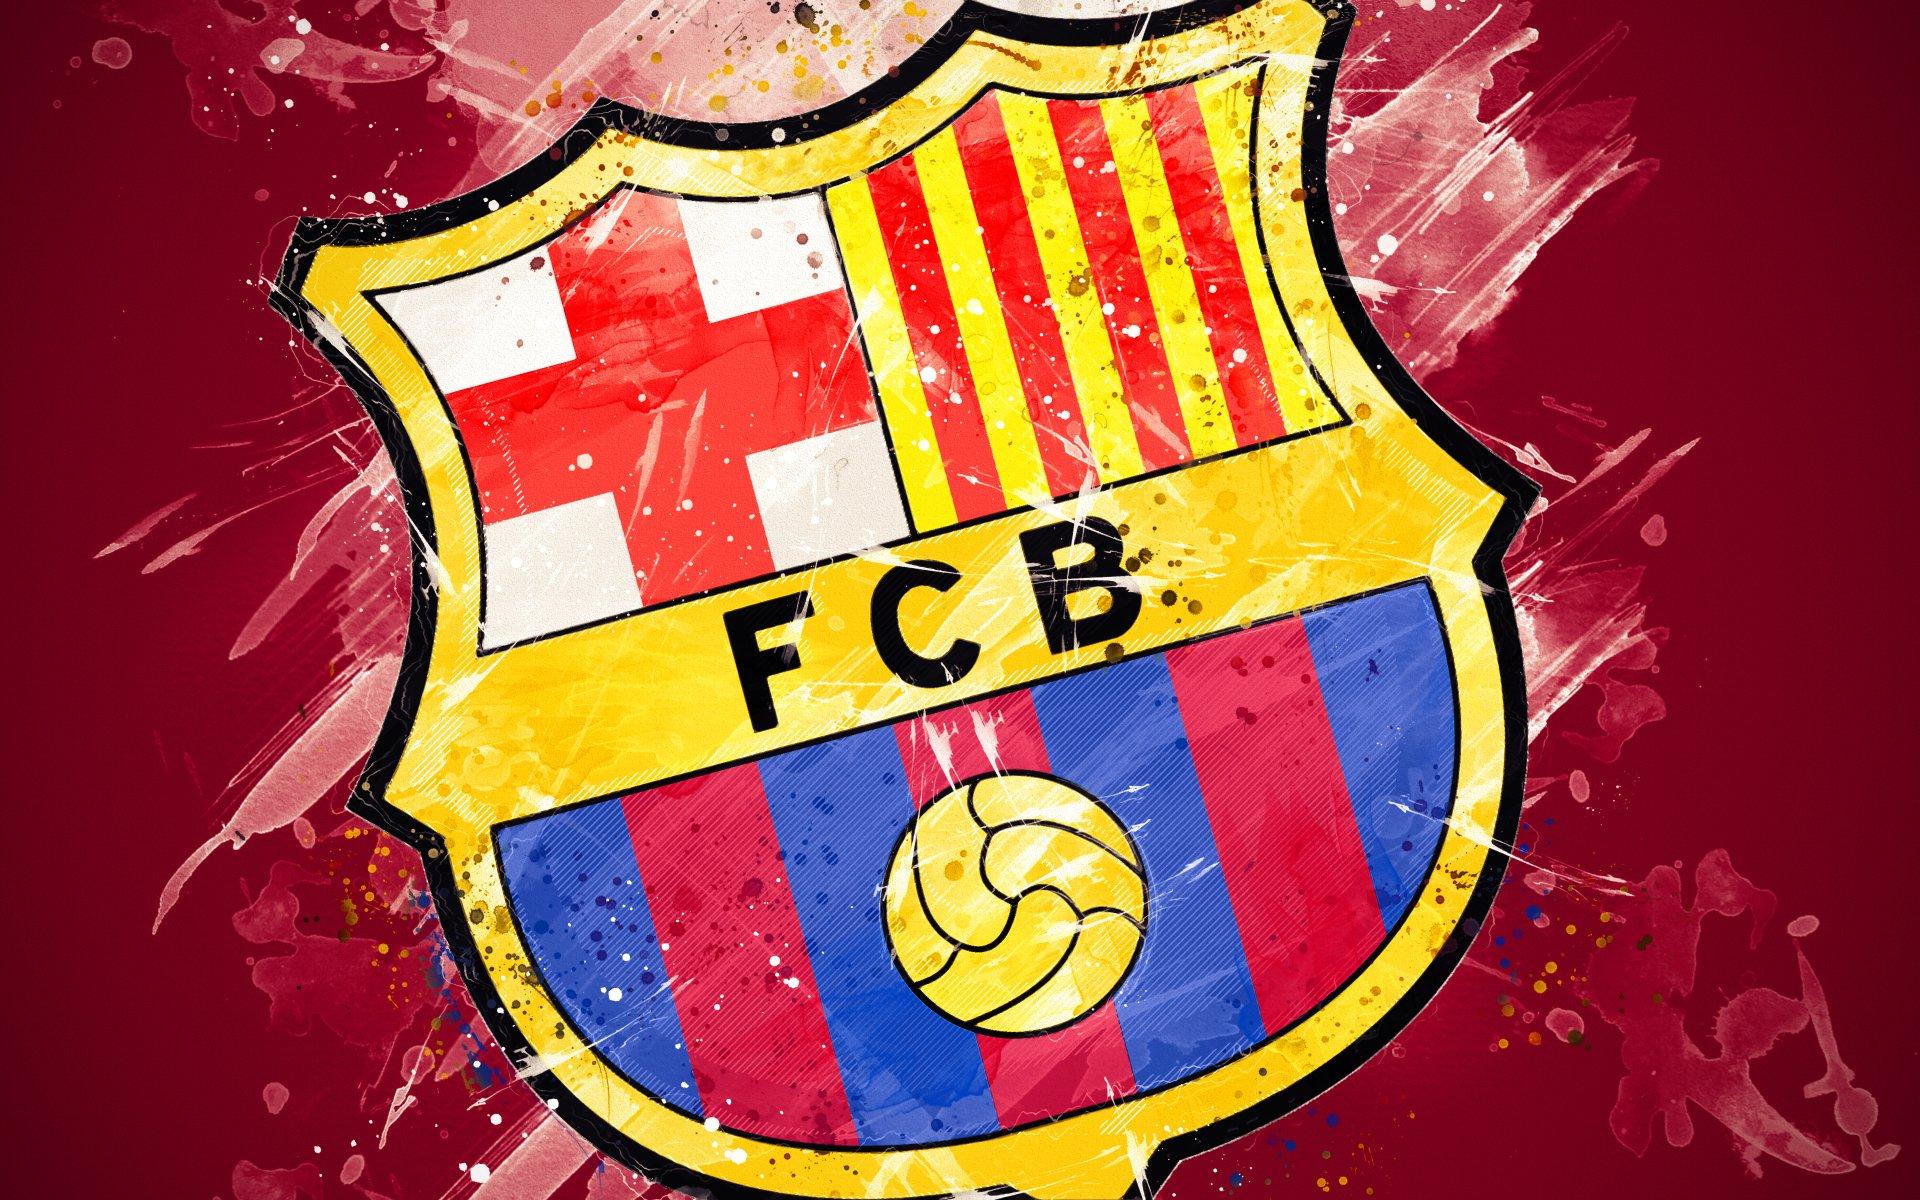 Barça Logo 4k Ultra Fond d'écran HD | Arrière-Plan | 3840x2400 | ID:969492 - Wallpaper Abyss